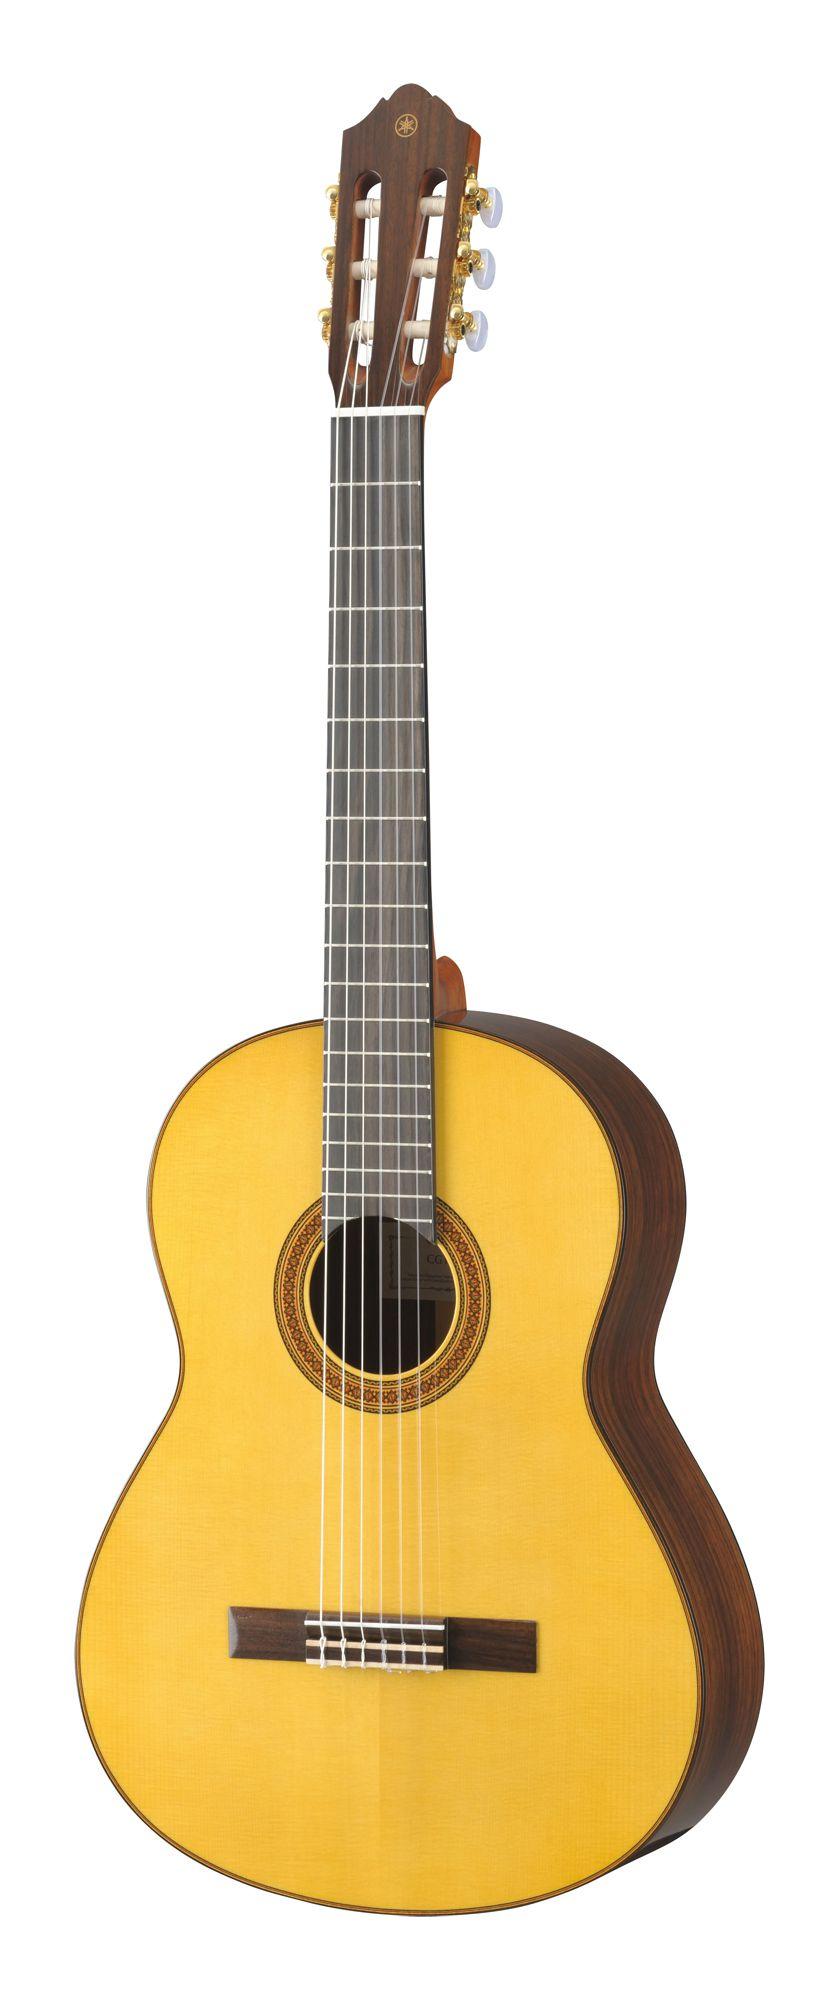 Violão Yamaha CG182S - Natural